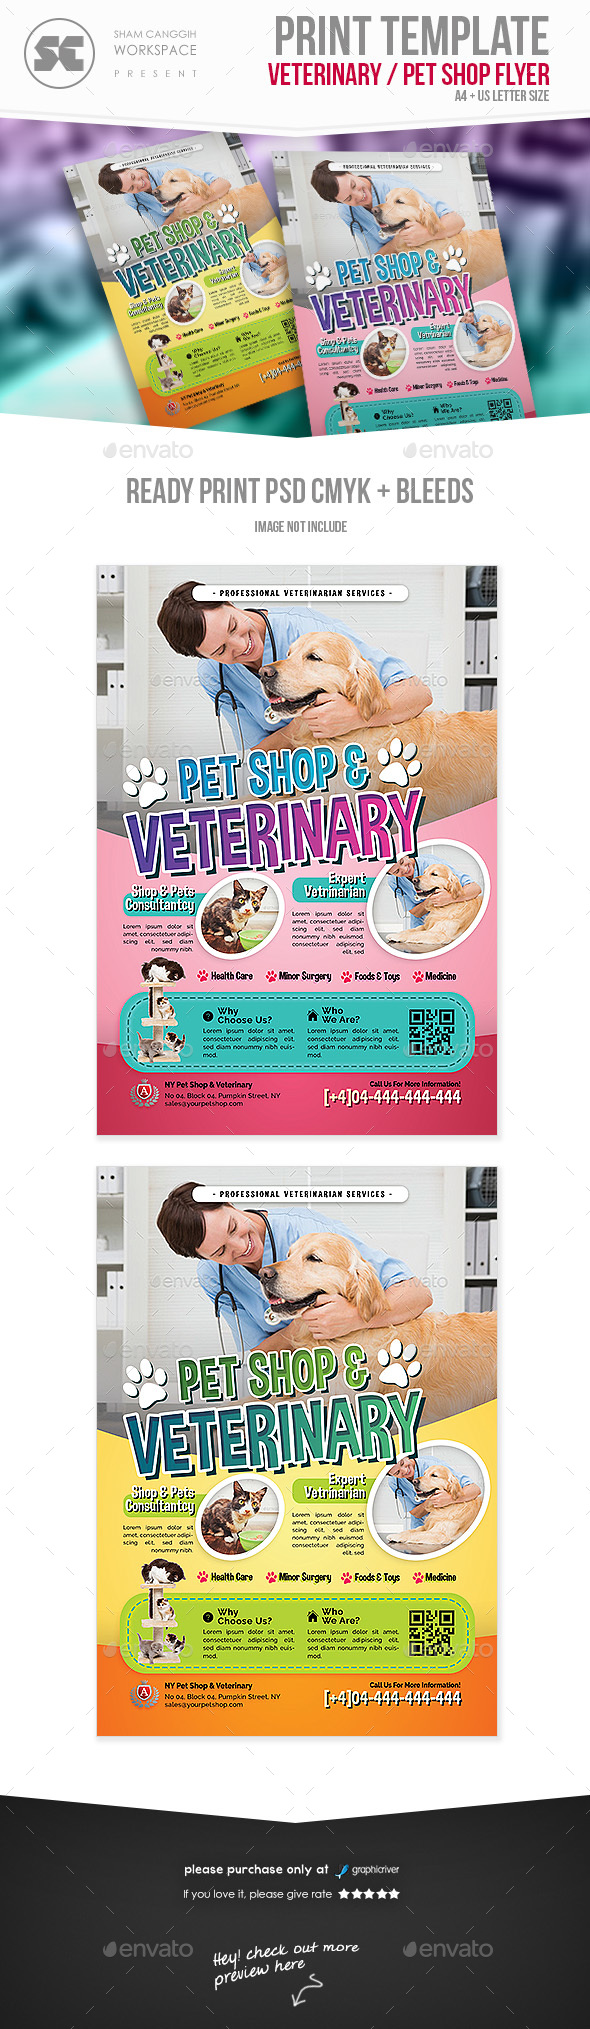 Pet Shop / Veterinary Flyer - Miscellaneous Events